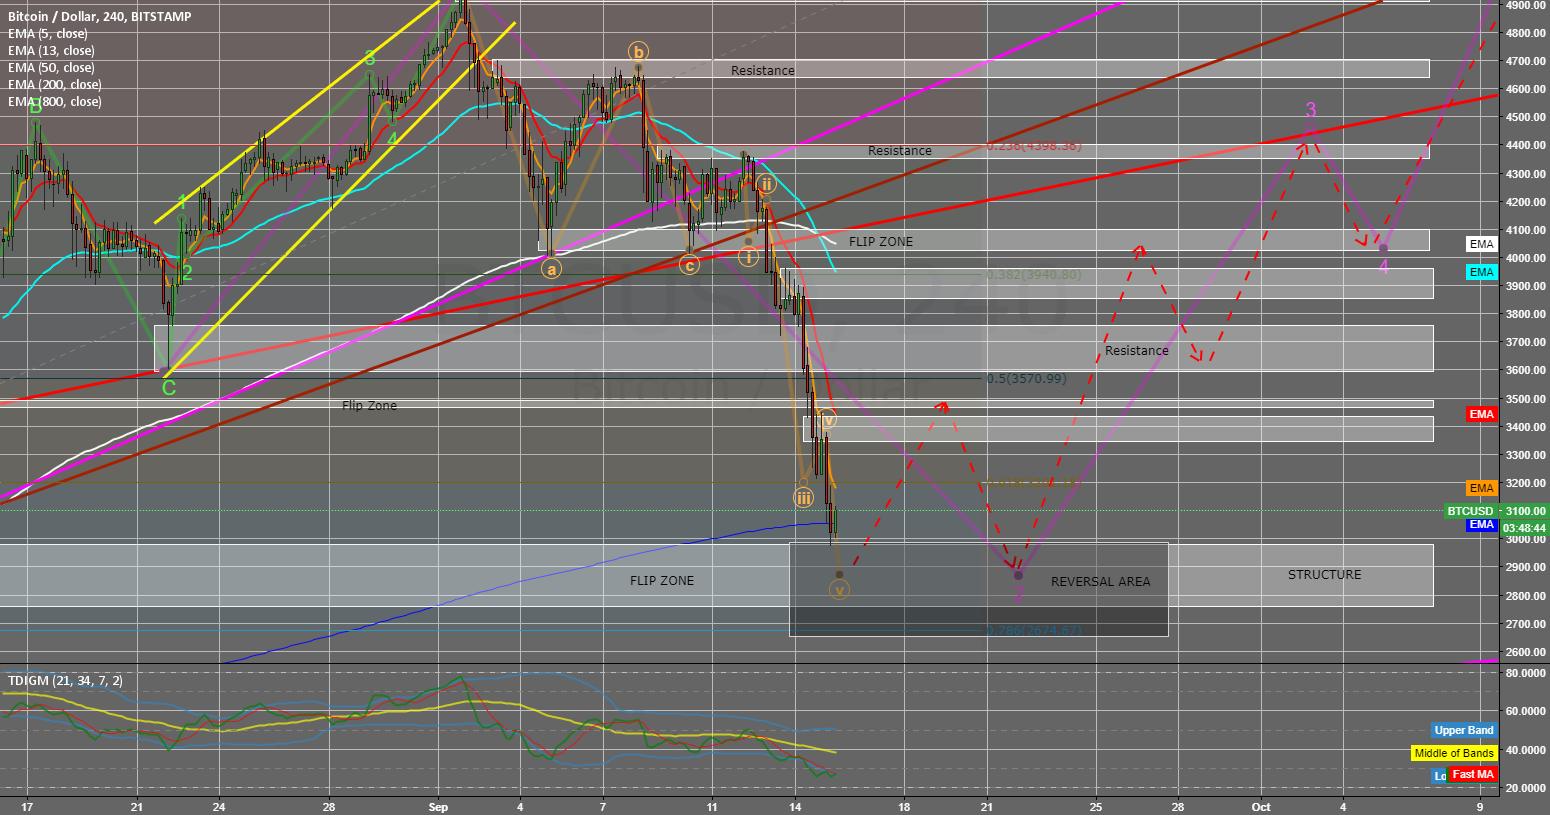 BTC Finally approaching Reversal Area?